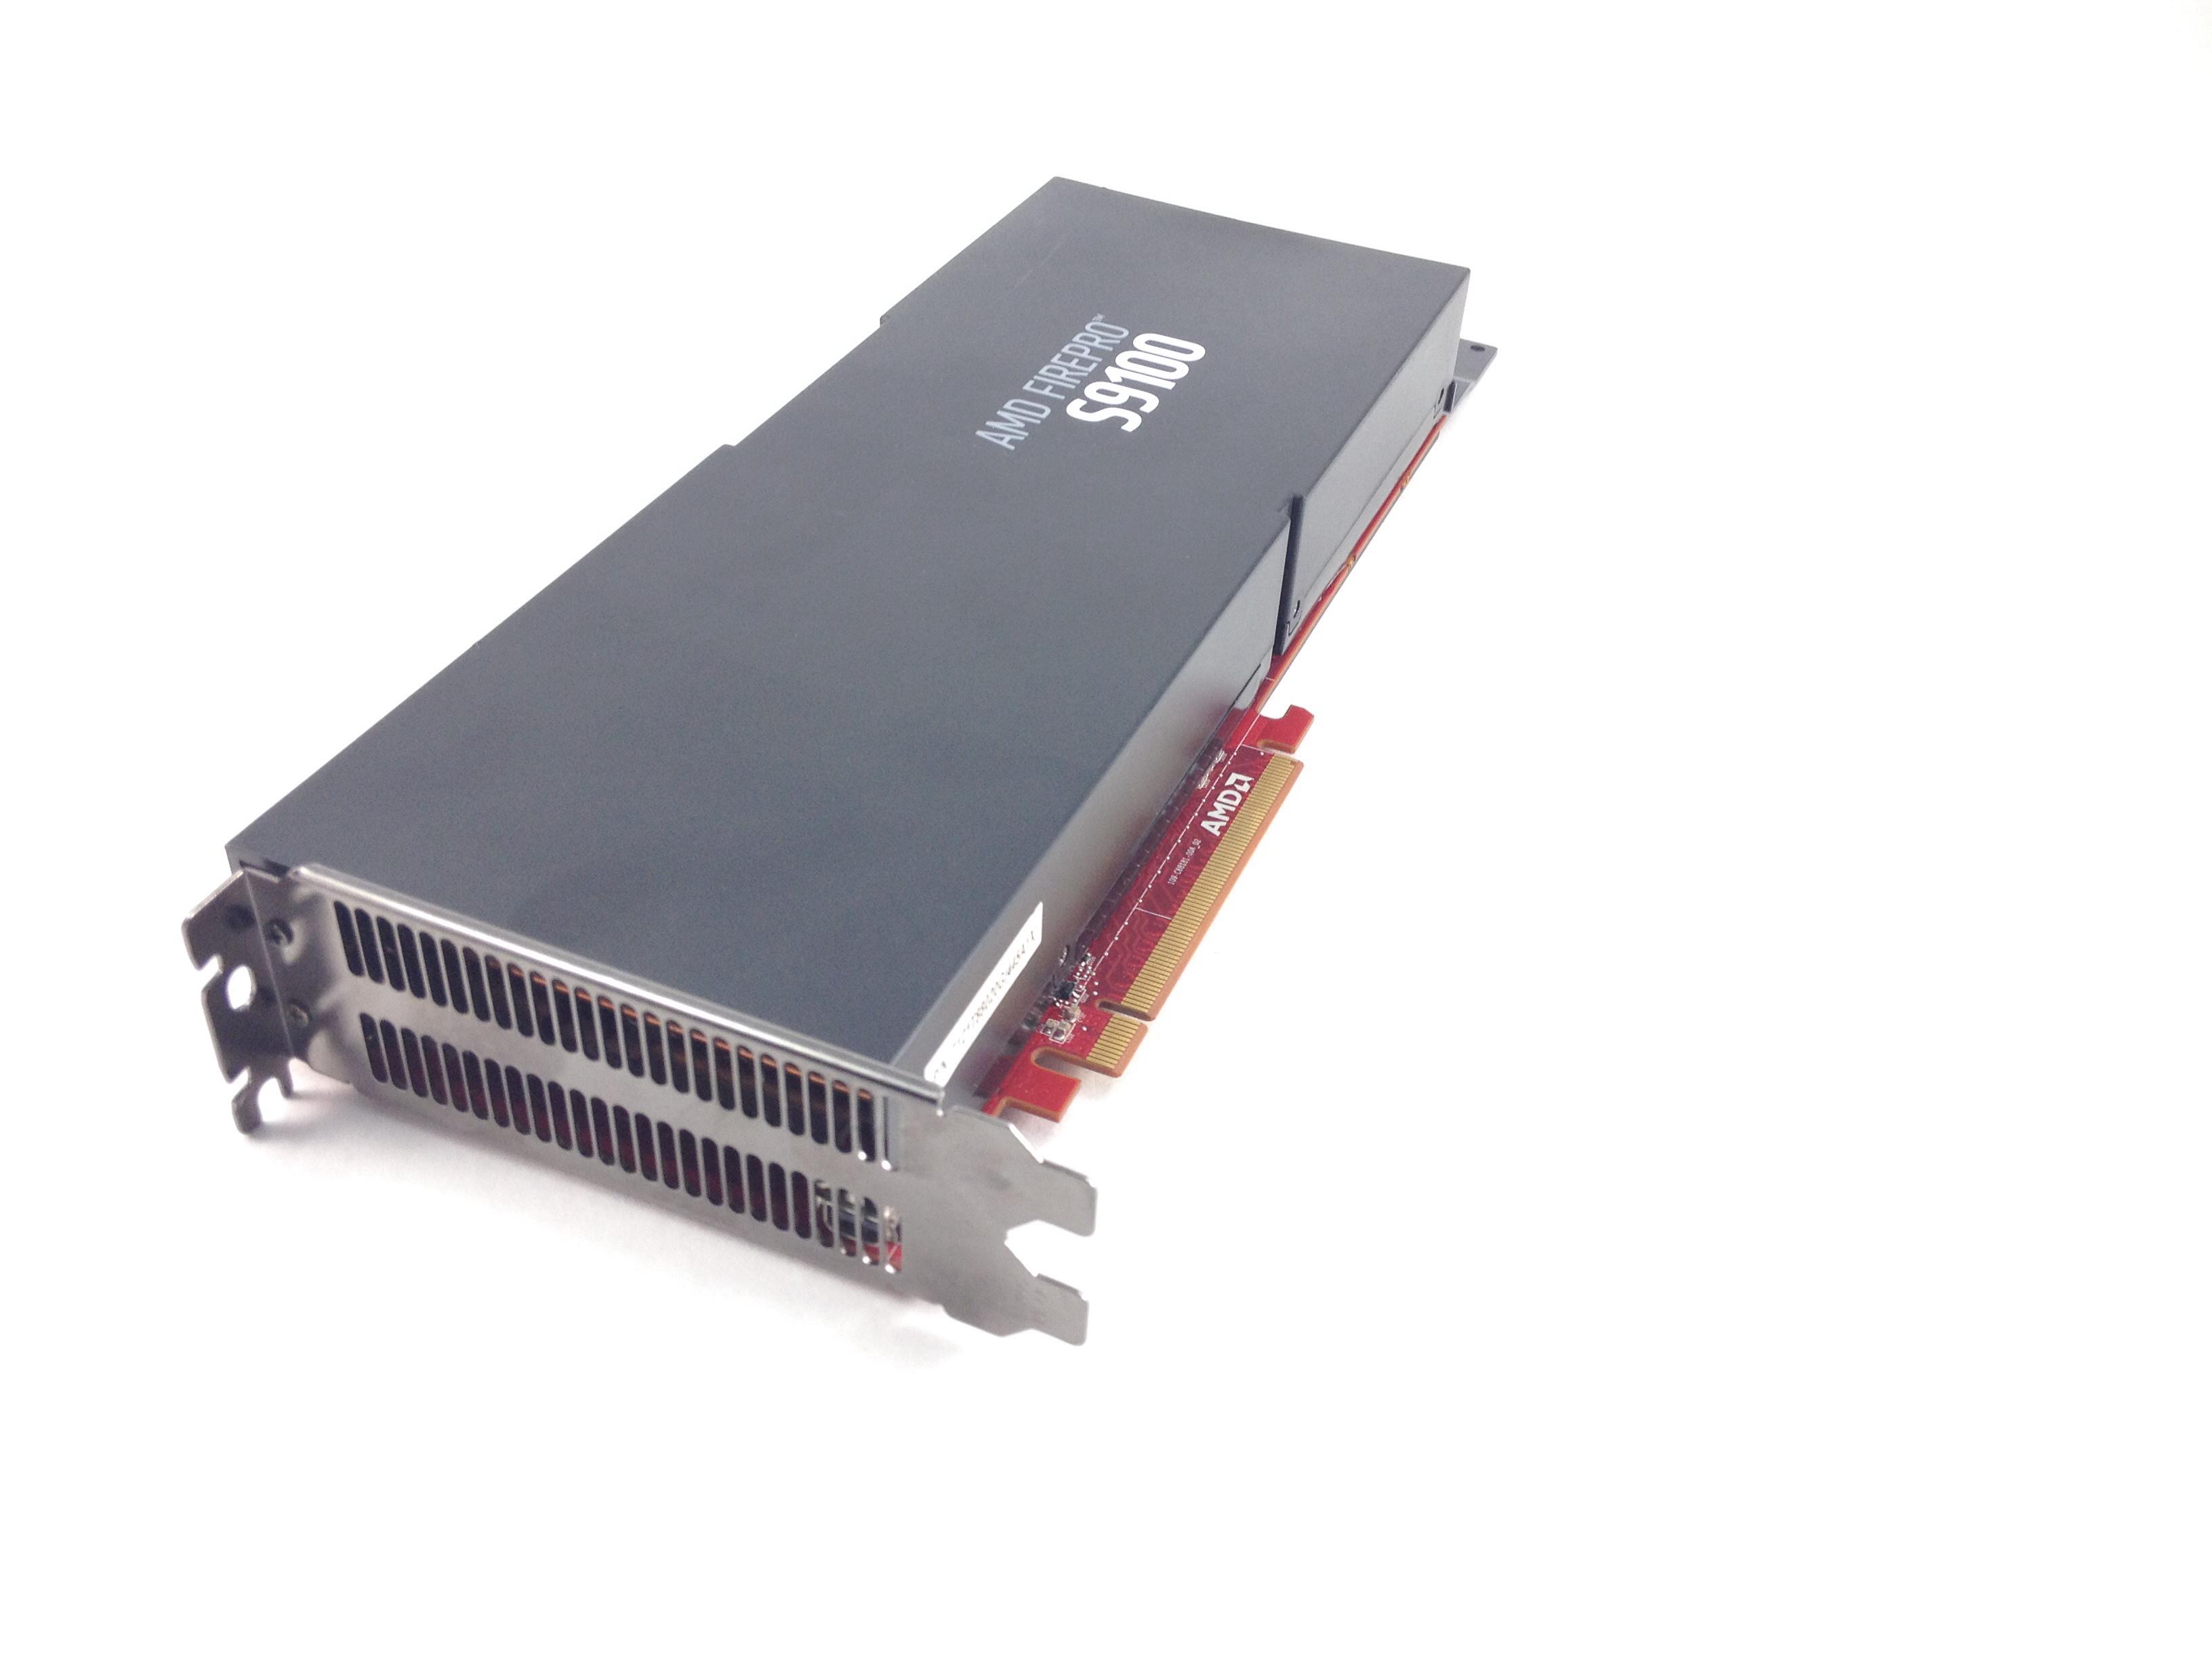 DELL NVIDIA QUADRO 4000 PCI EXPRESS 2 0 X16 GDDR5 DVI-I